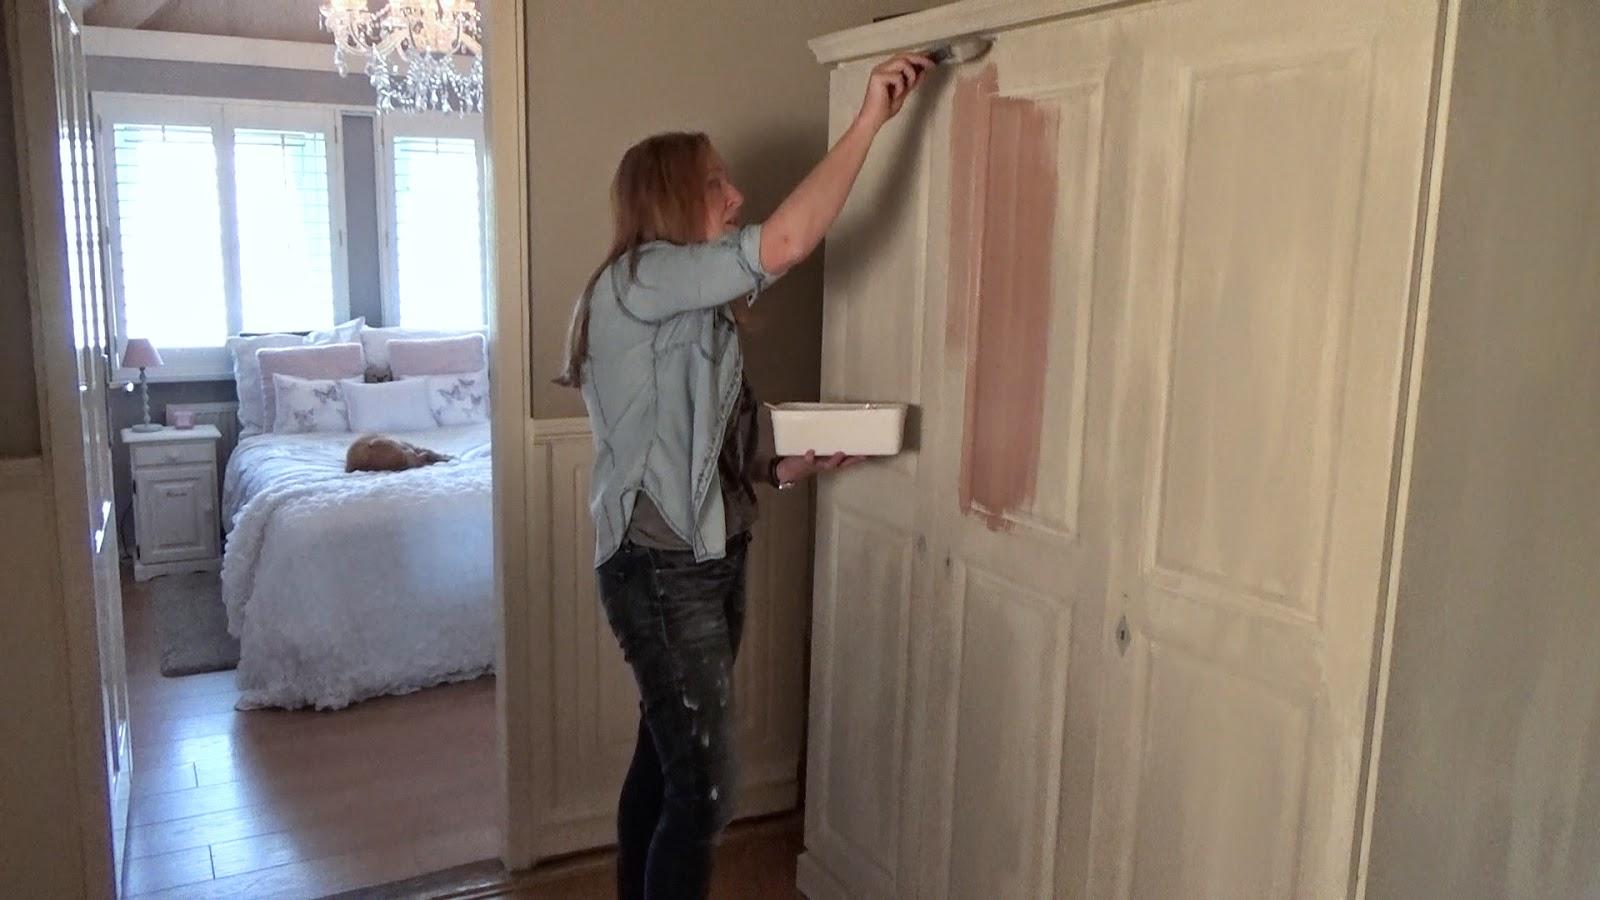 Kalkverf op kast aanbrengen pure and van losenoord verf en wand putten - Verf muren van ...